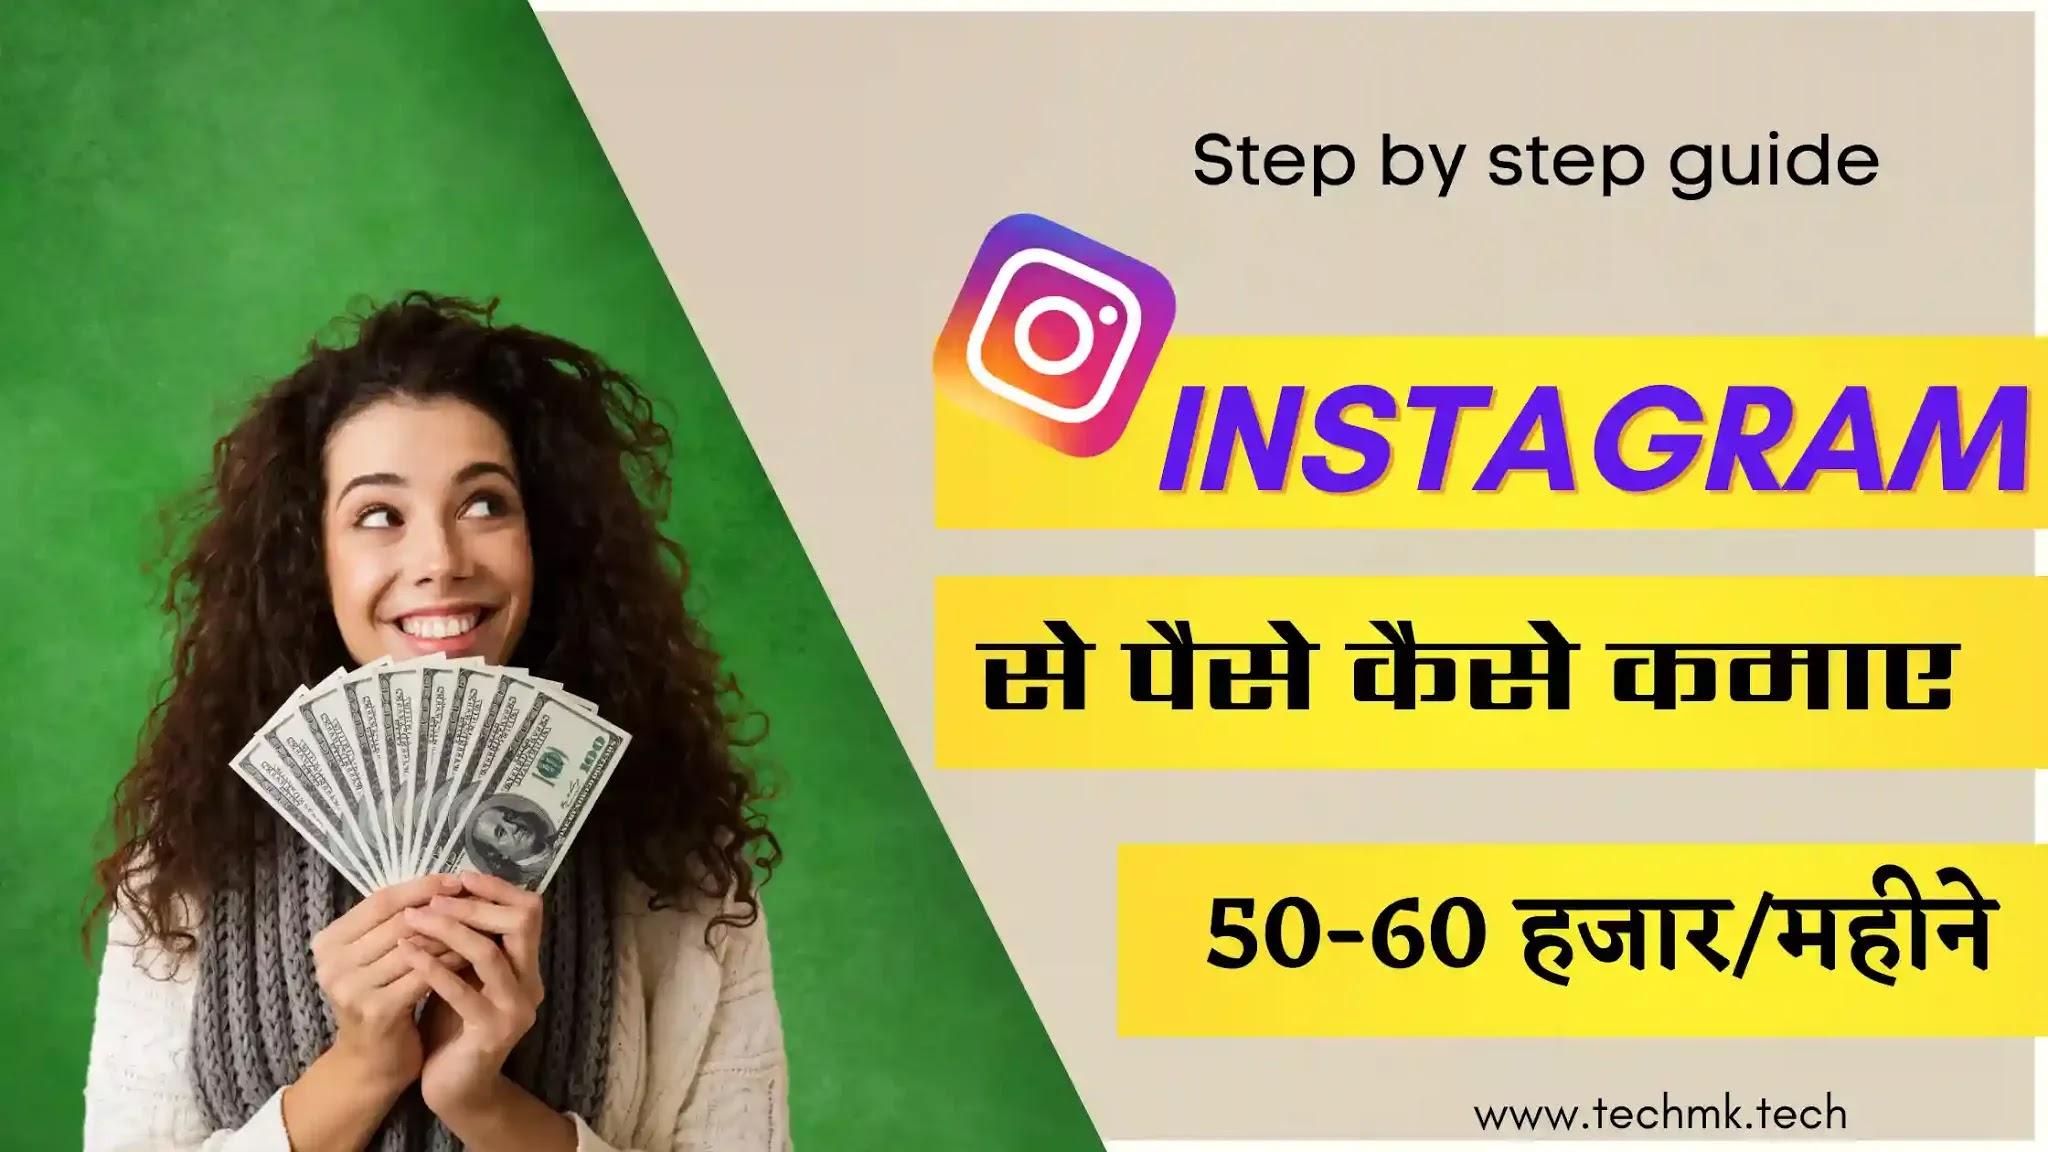 How-to-make-money-with-instagram, instagram, adsense, make money online, monetize,